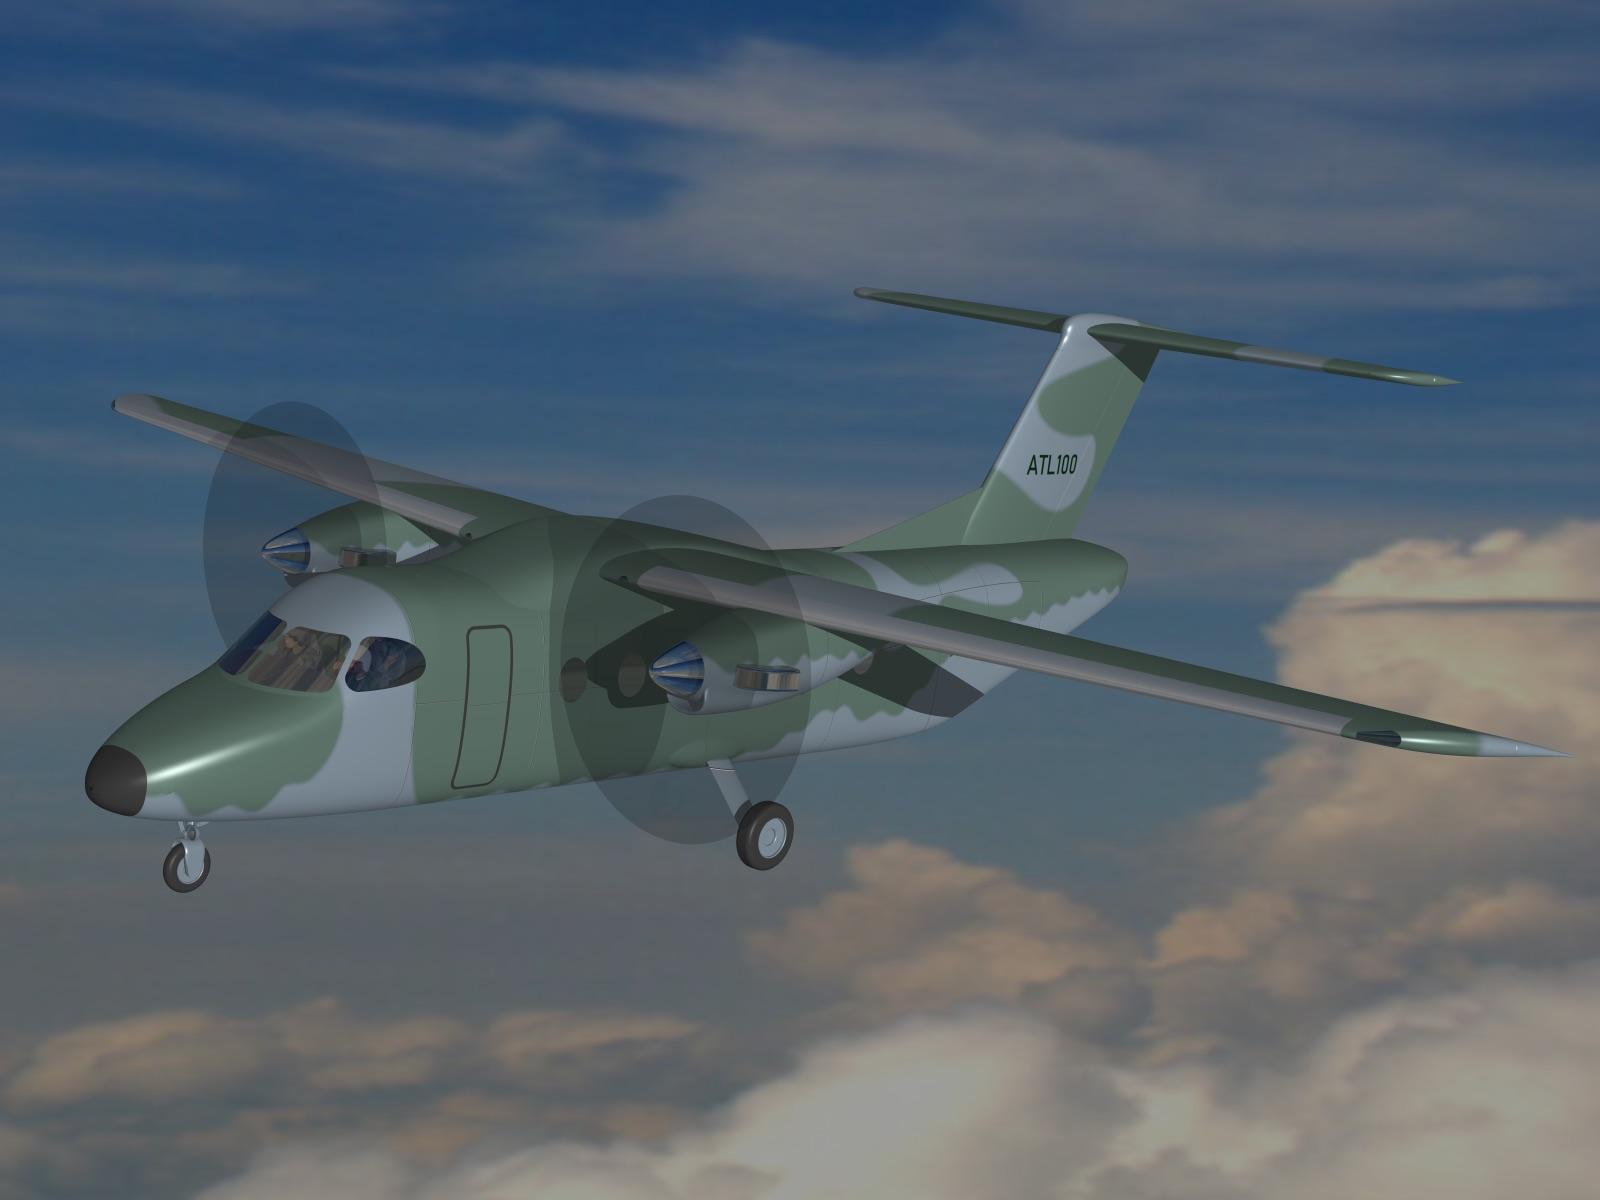 Brazilian Desaer and Brazilian CEiiA to Develop ATL-100 Light Transport Aircraft